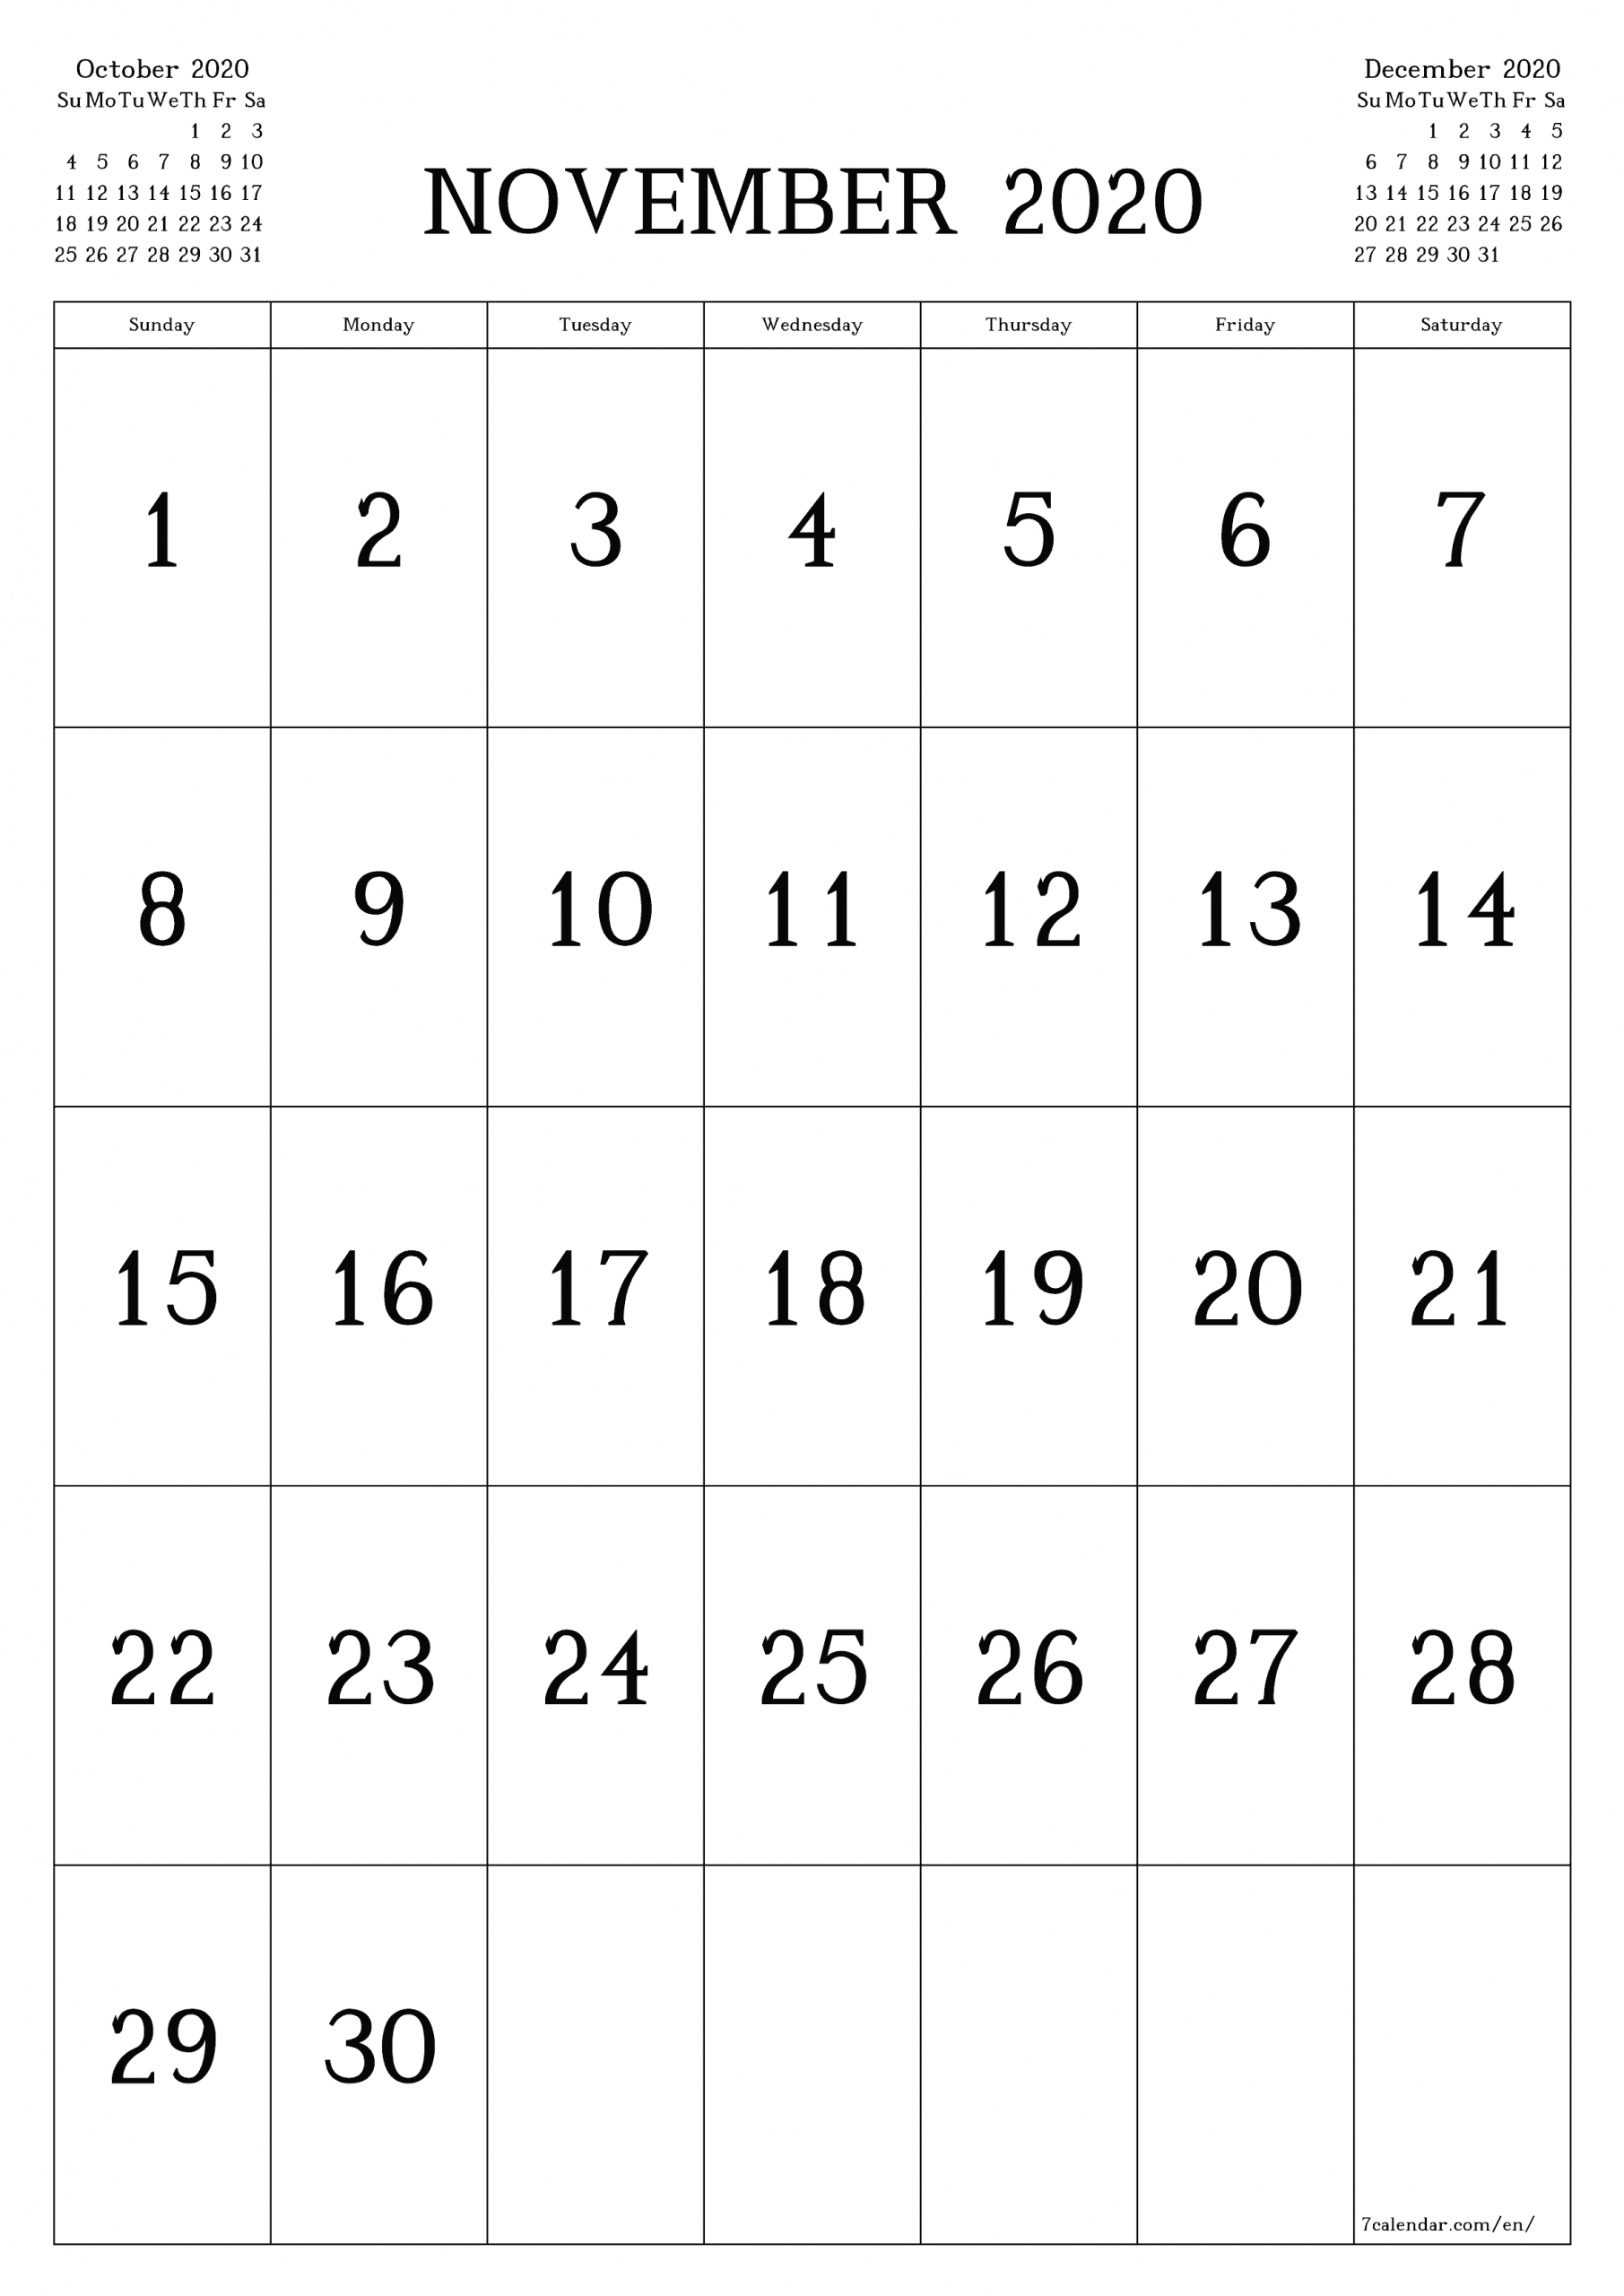 Take November Calender Full Size